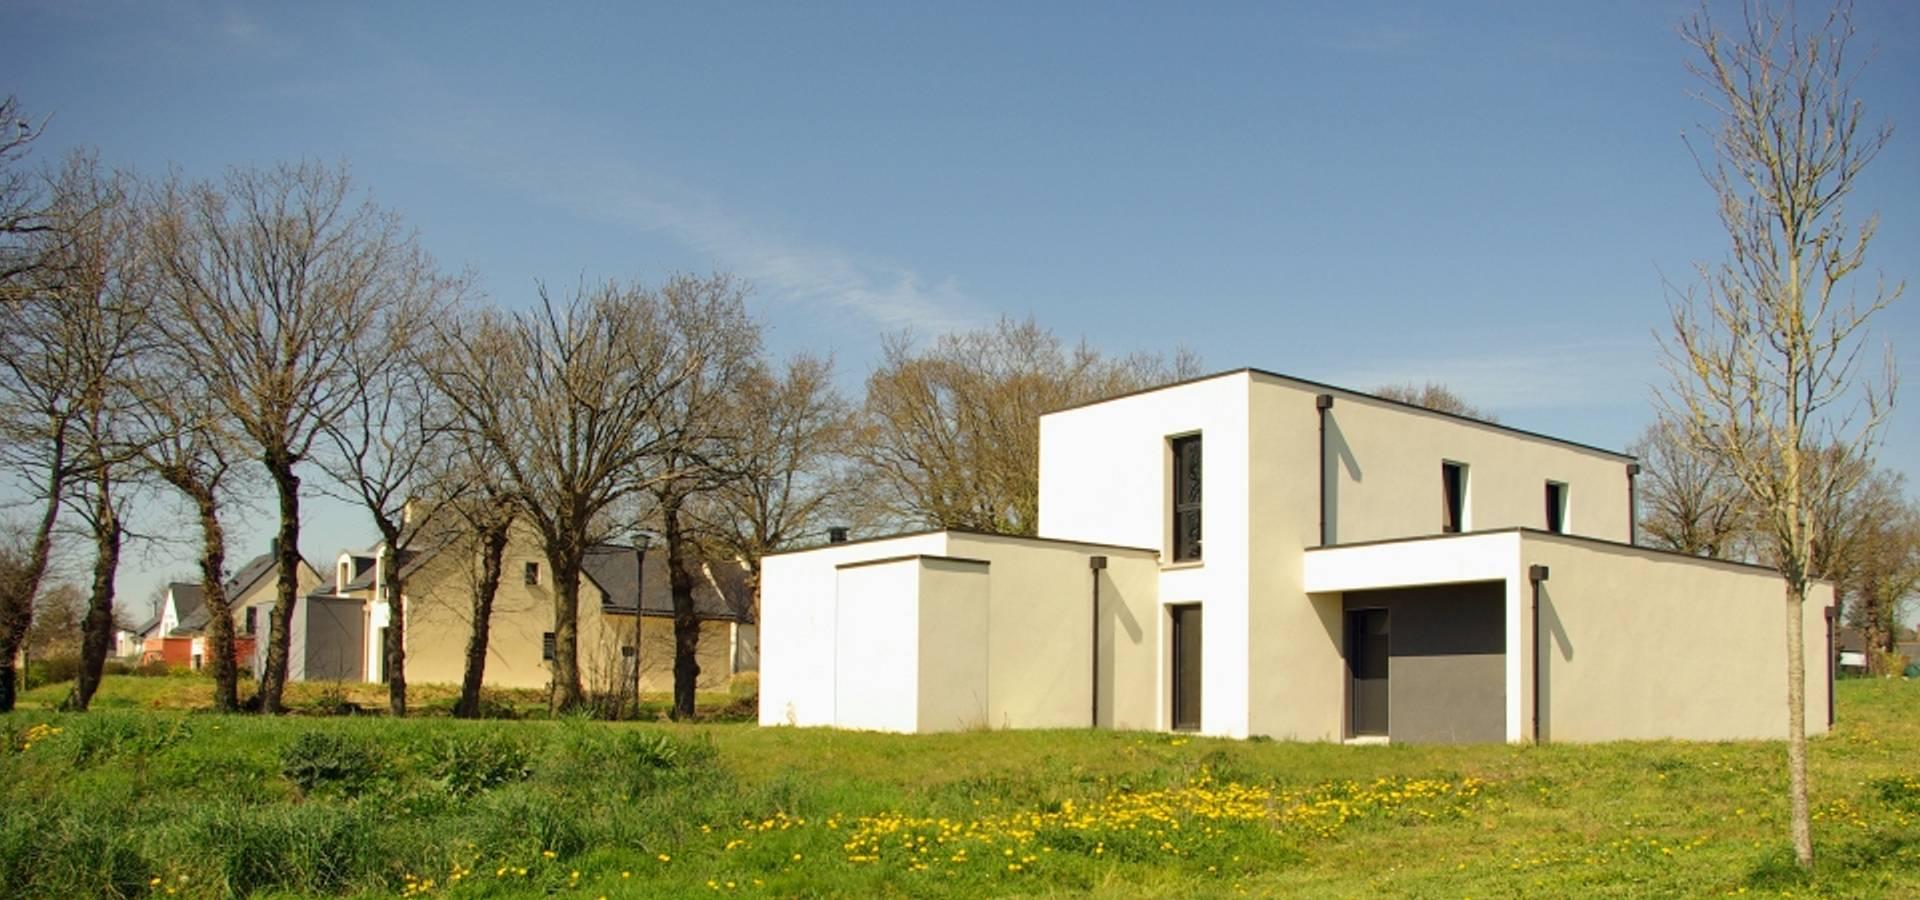 bAAt architecture